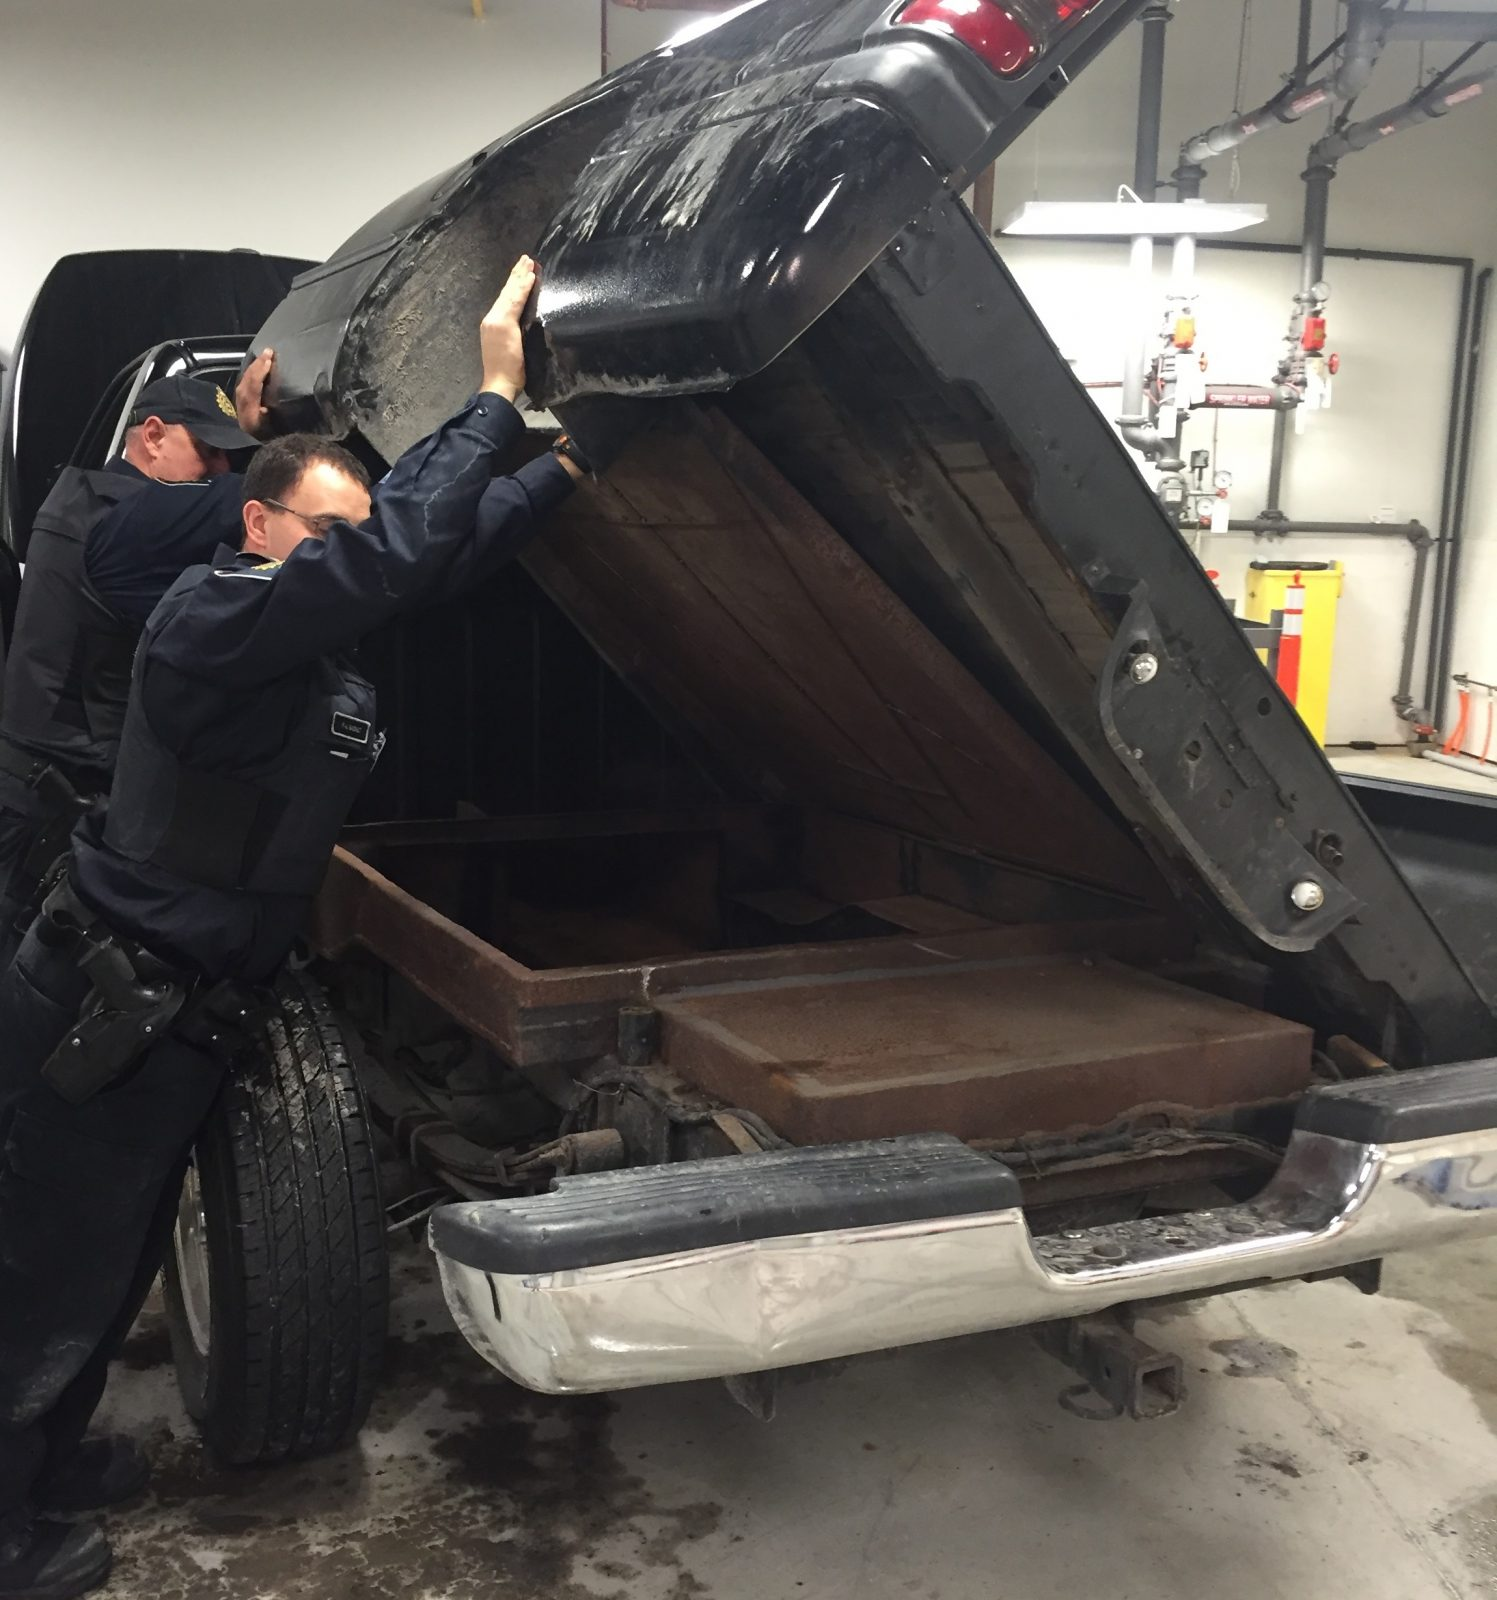 Smugglers modify trucks to hide contraband tobacco